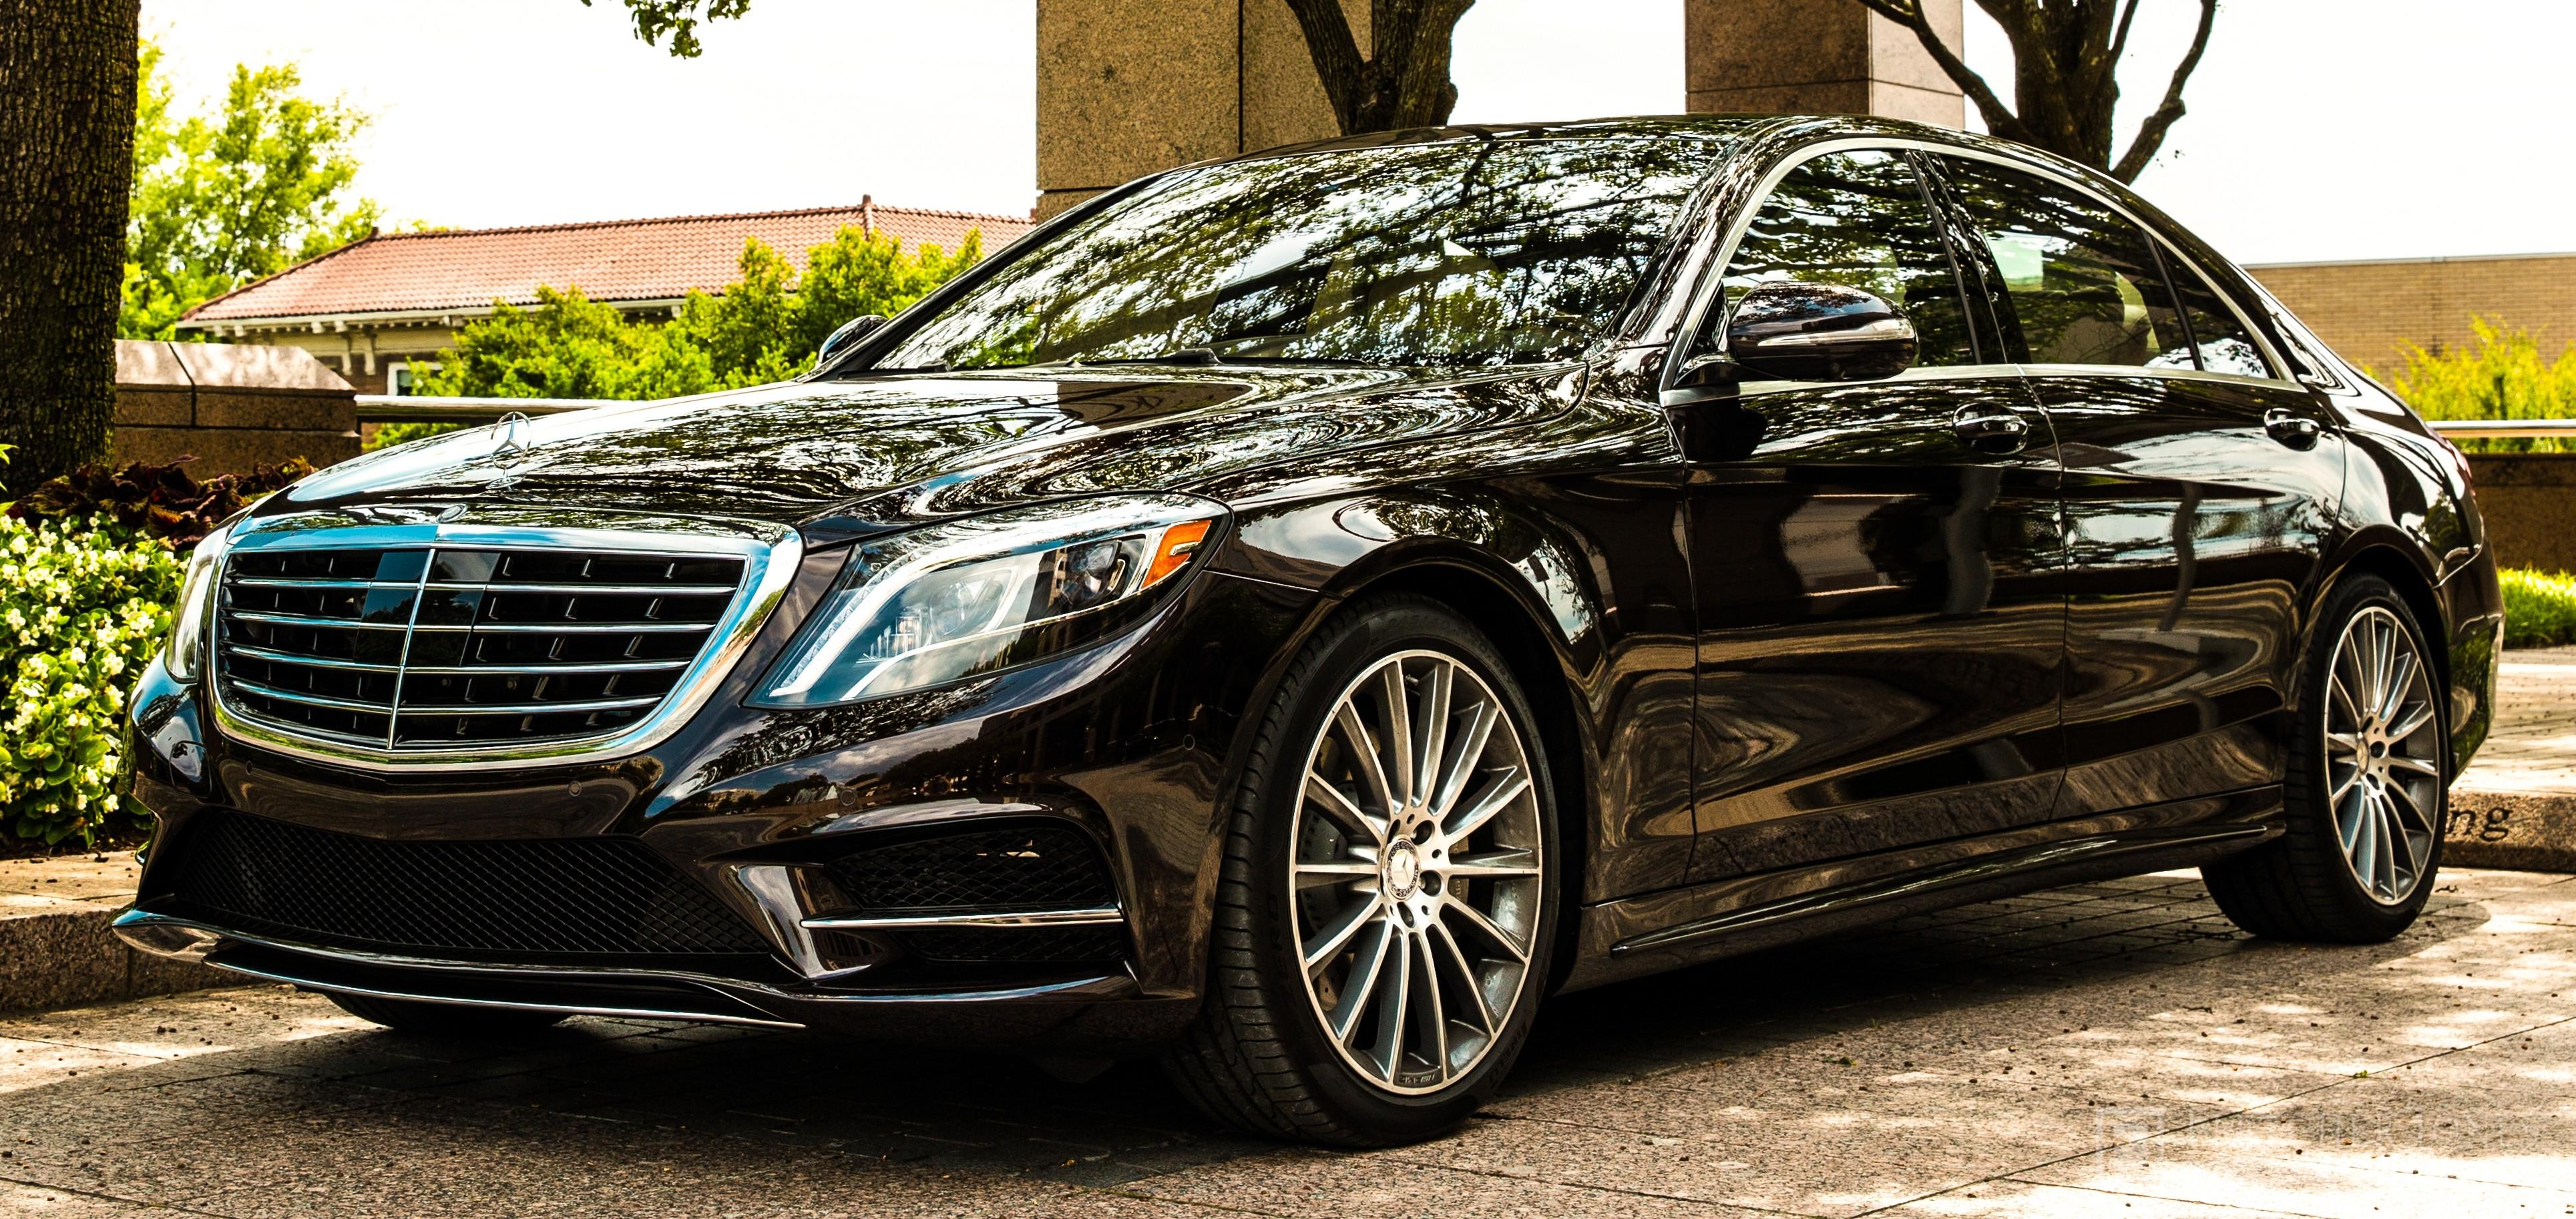 Employee spotlight q a with jim jordan mercedes benz for Mercedes benz dealerships in chicago area